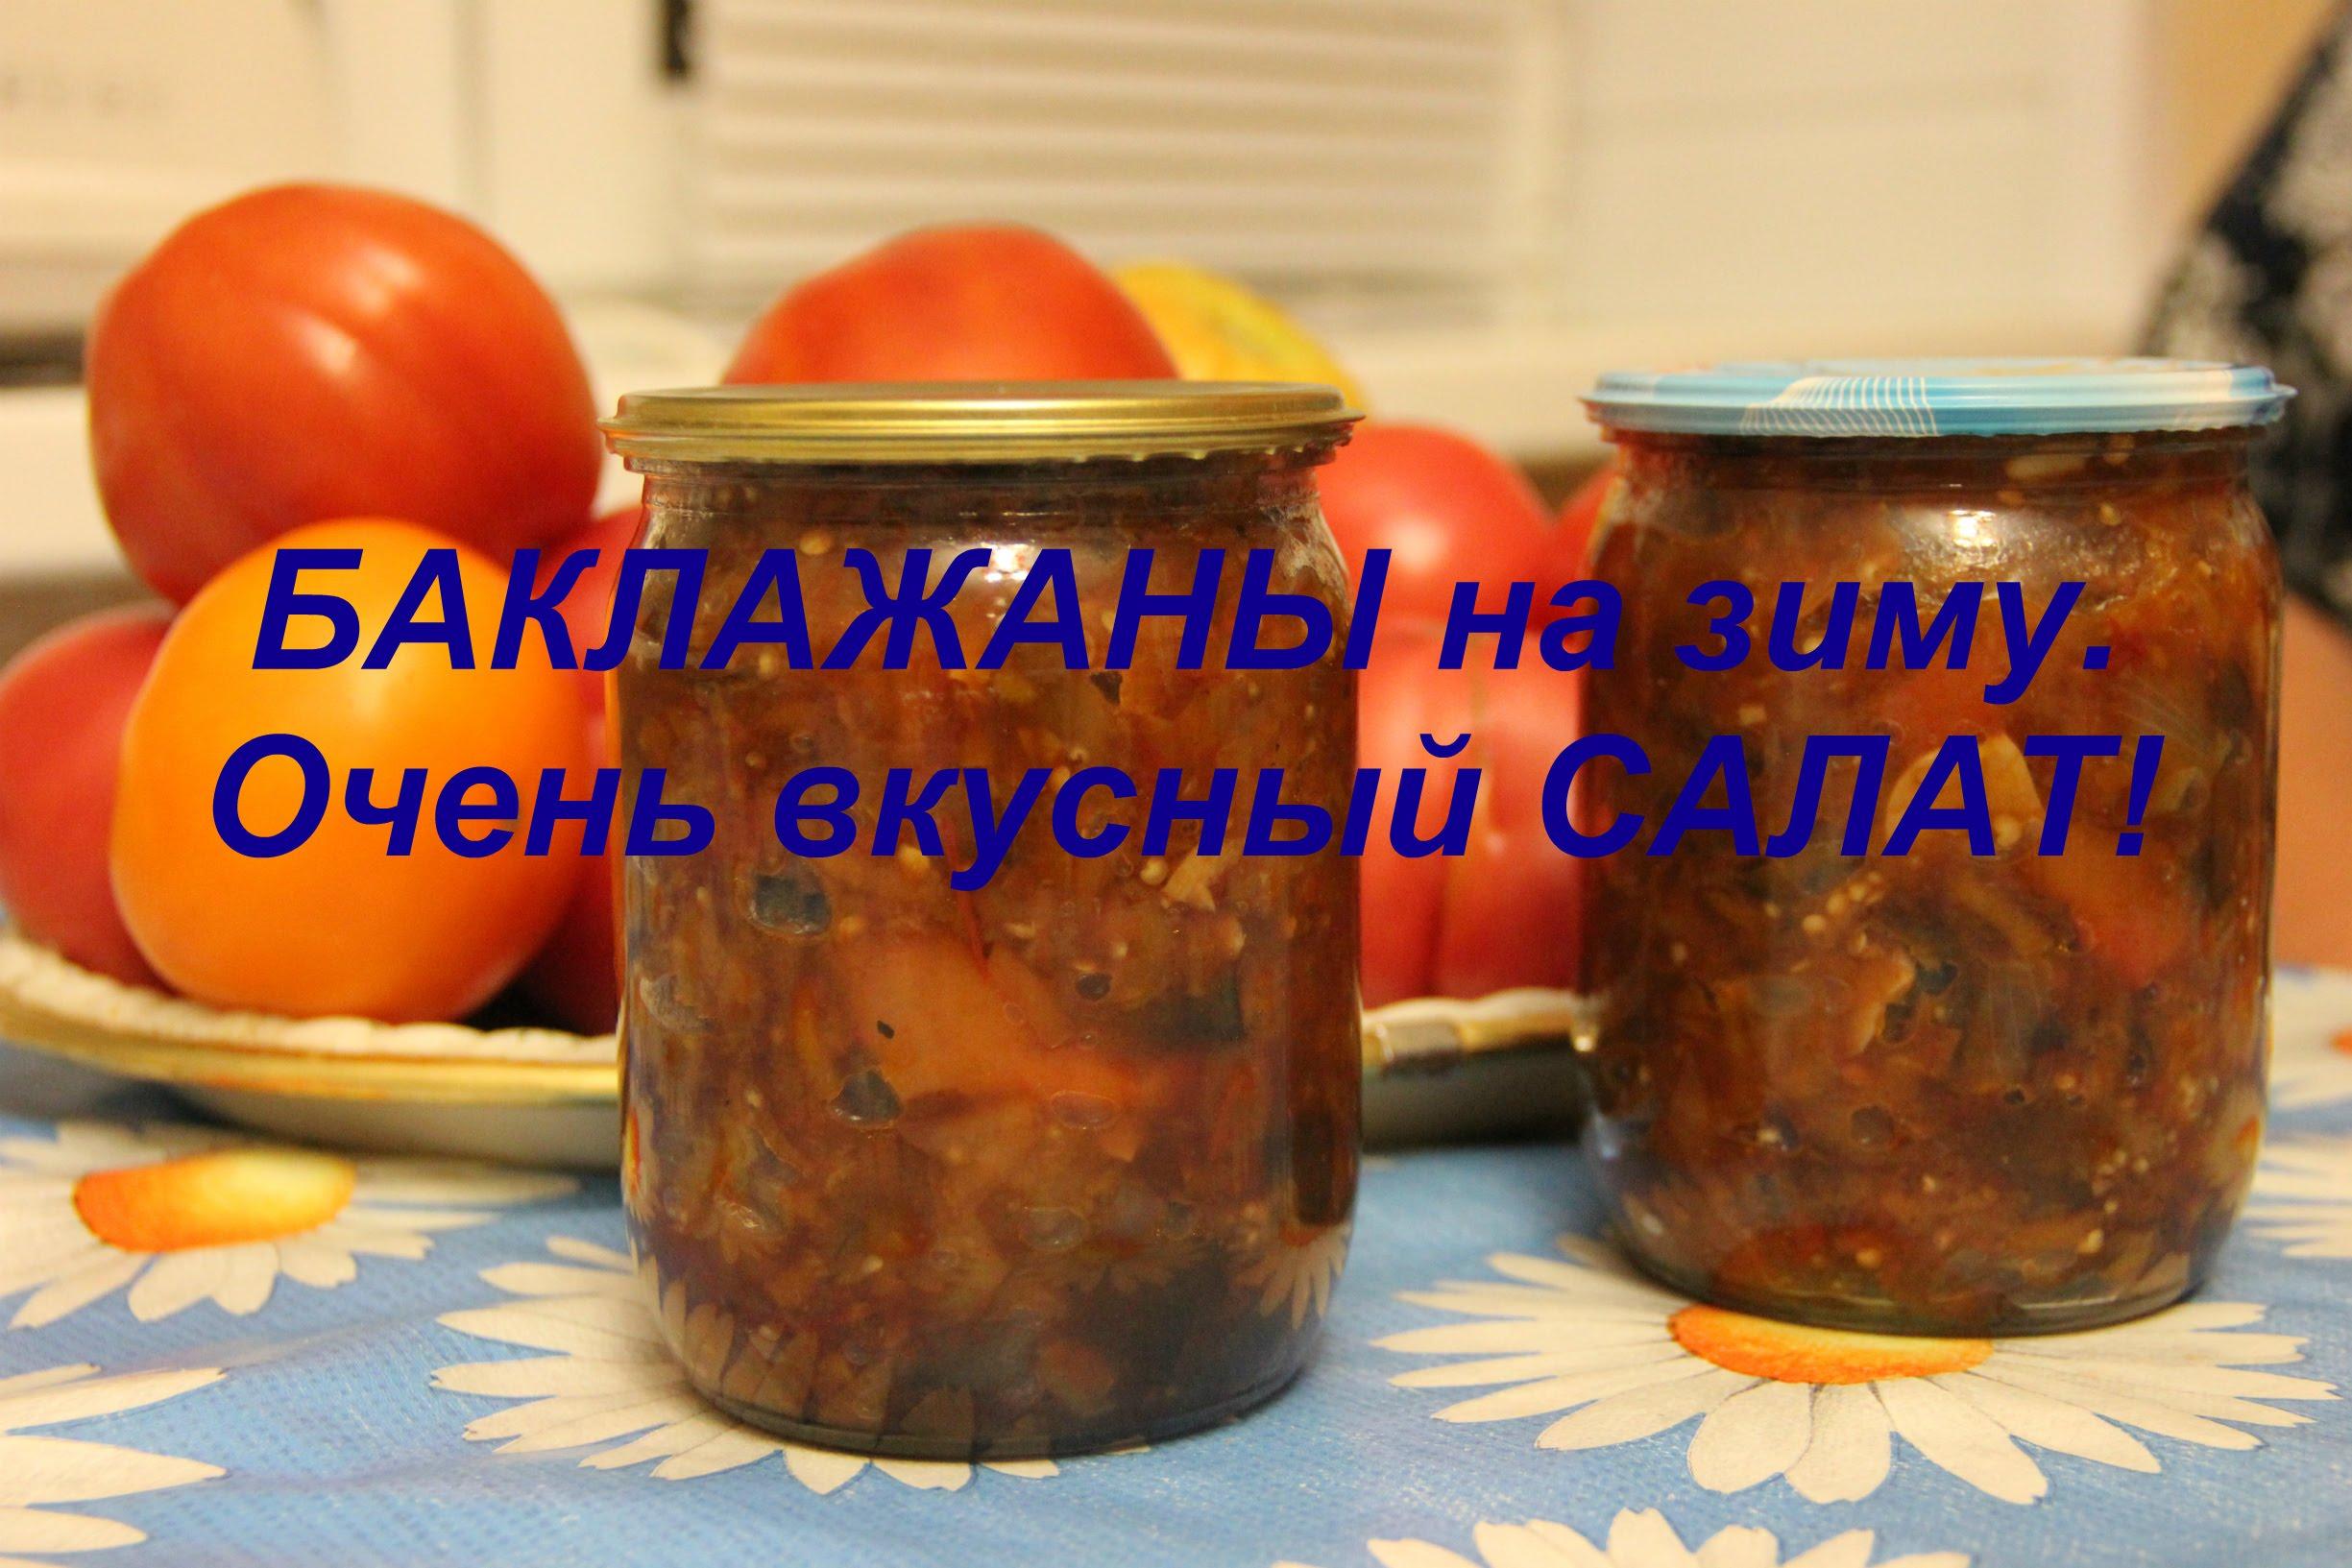 консервируем баклажаны на зиму рецепты с фото